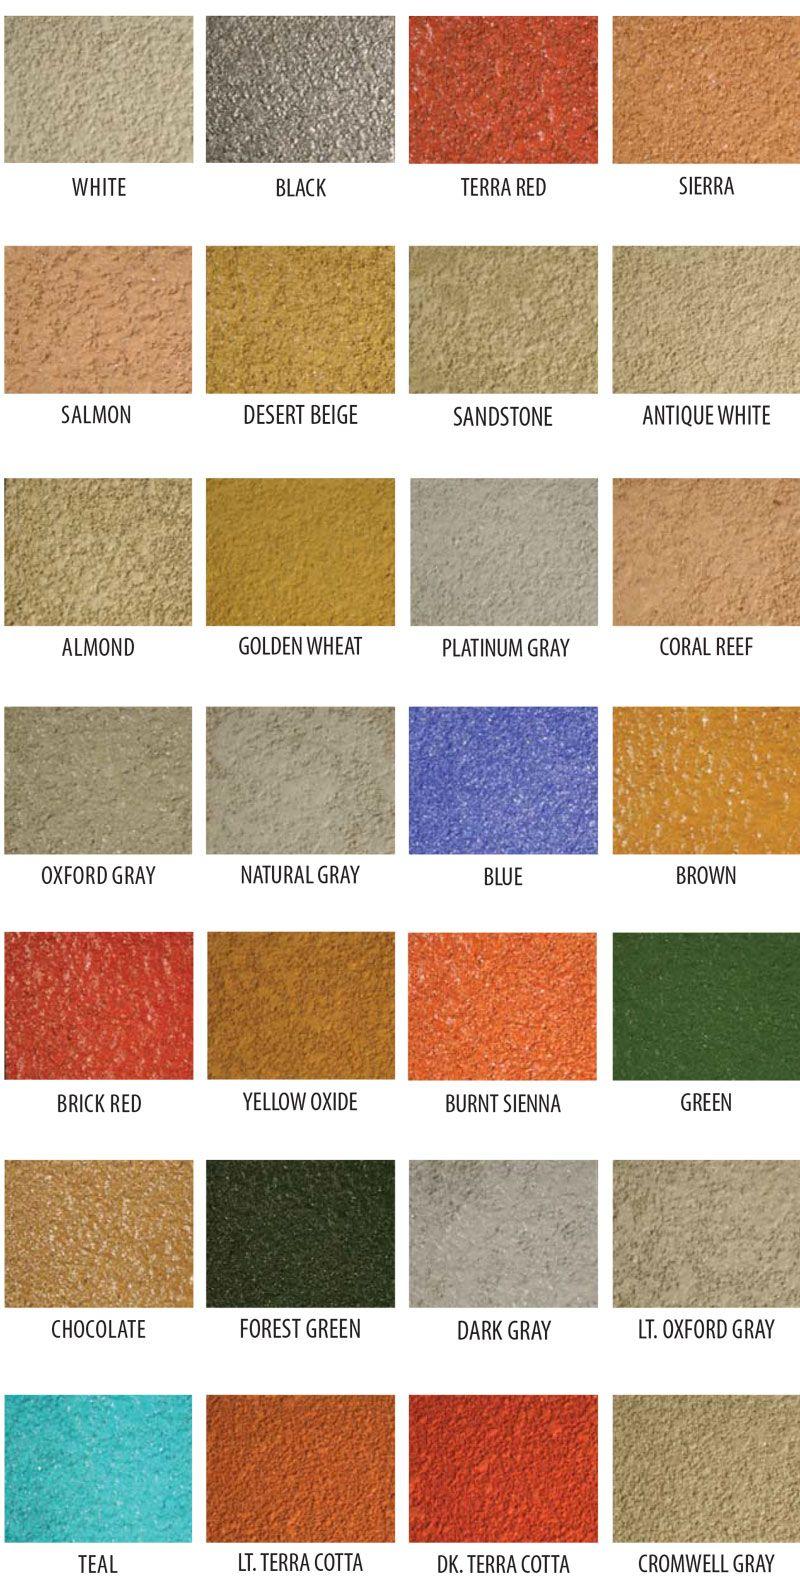 Cti Acrylistain Color Chart Stained Concrete Brown Brick Platinum Grey